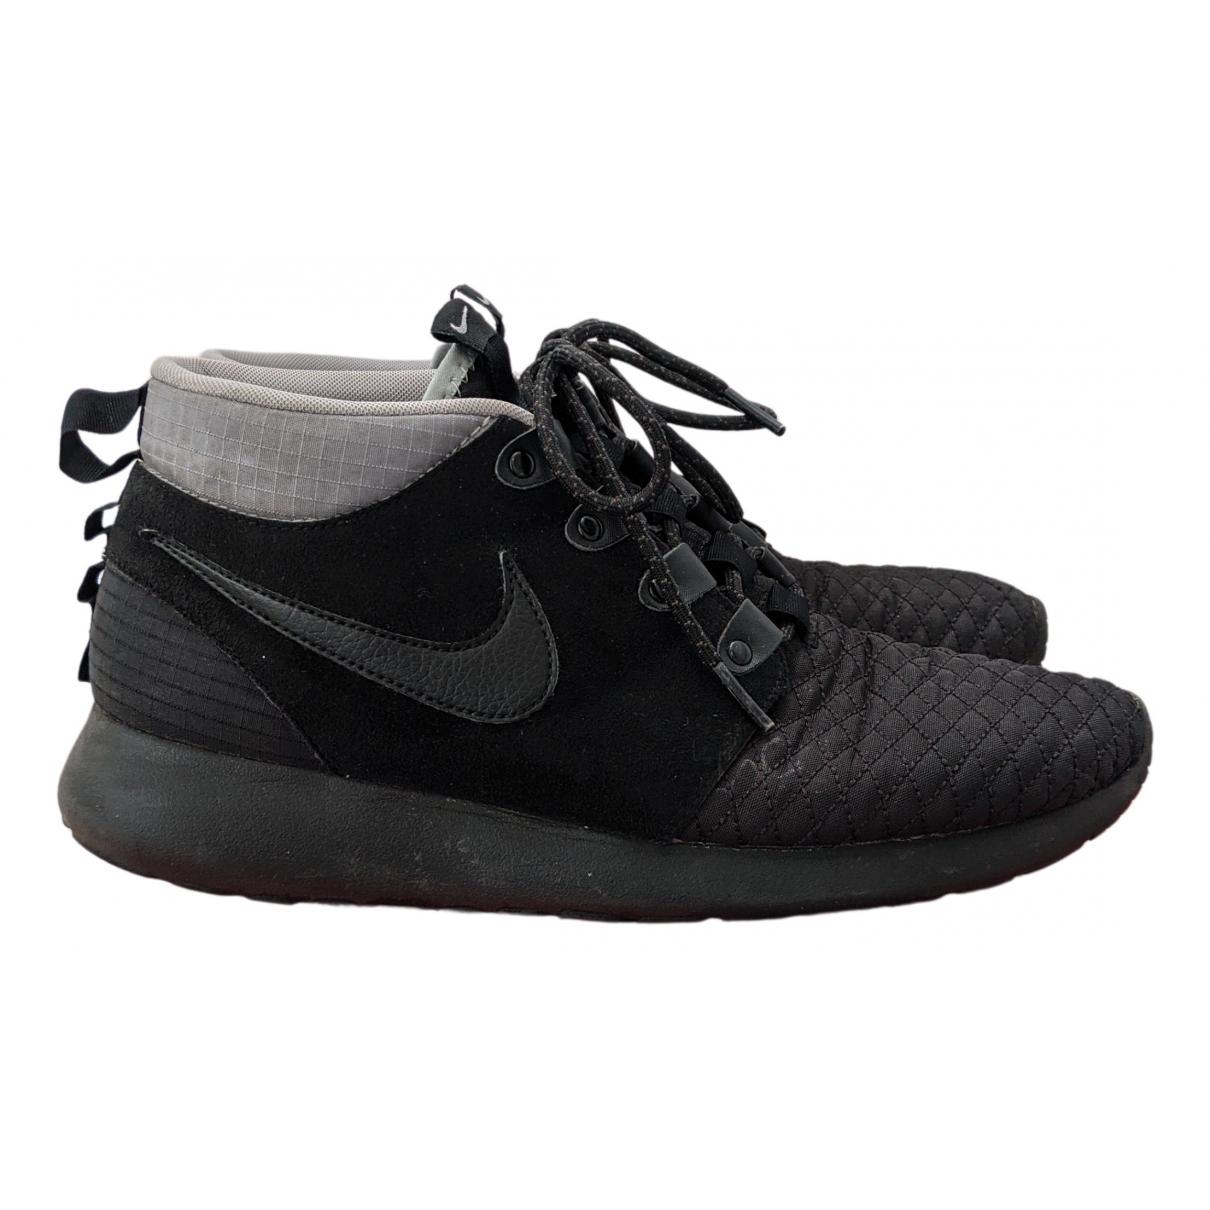 Nike Roshe Run Black Suede Trainers for Men 7 UK